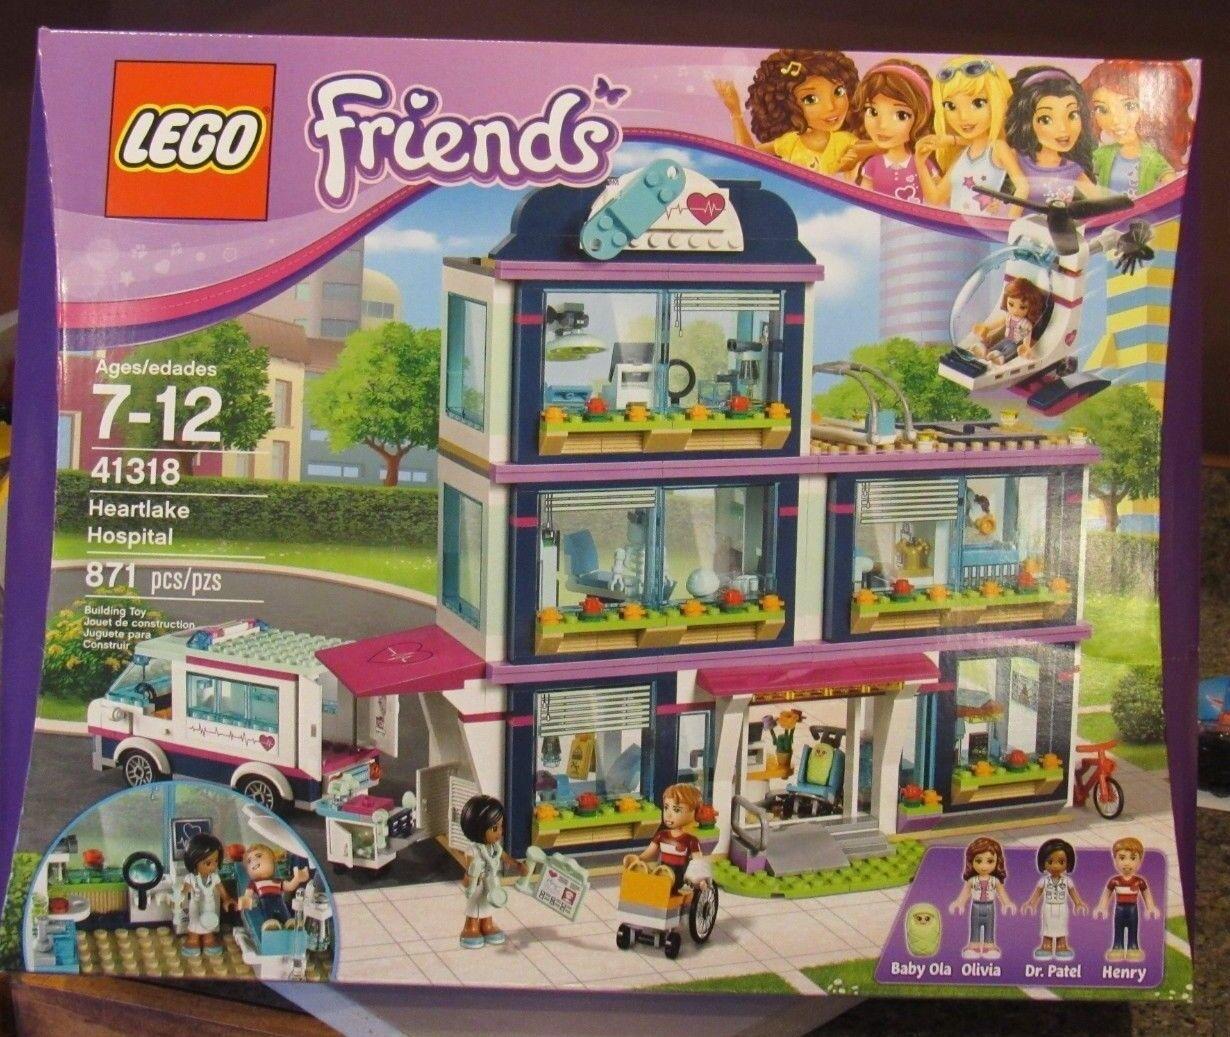 LEGO Friends Heartlake Hospital 41318 Baby Ola, Dr Patel Brand New & Sealed